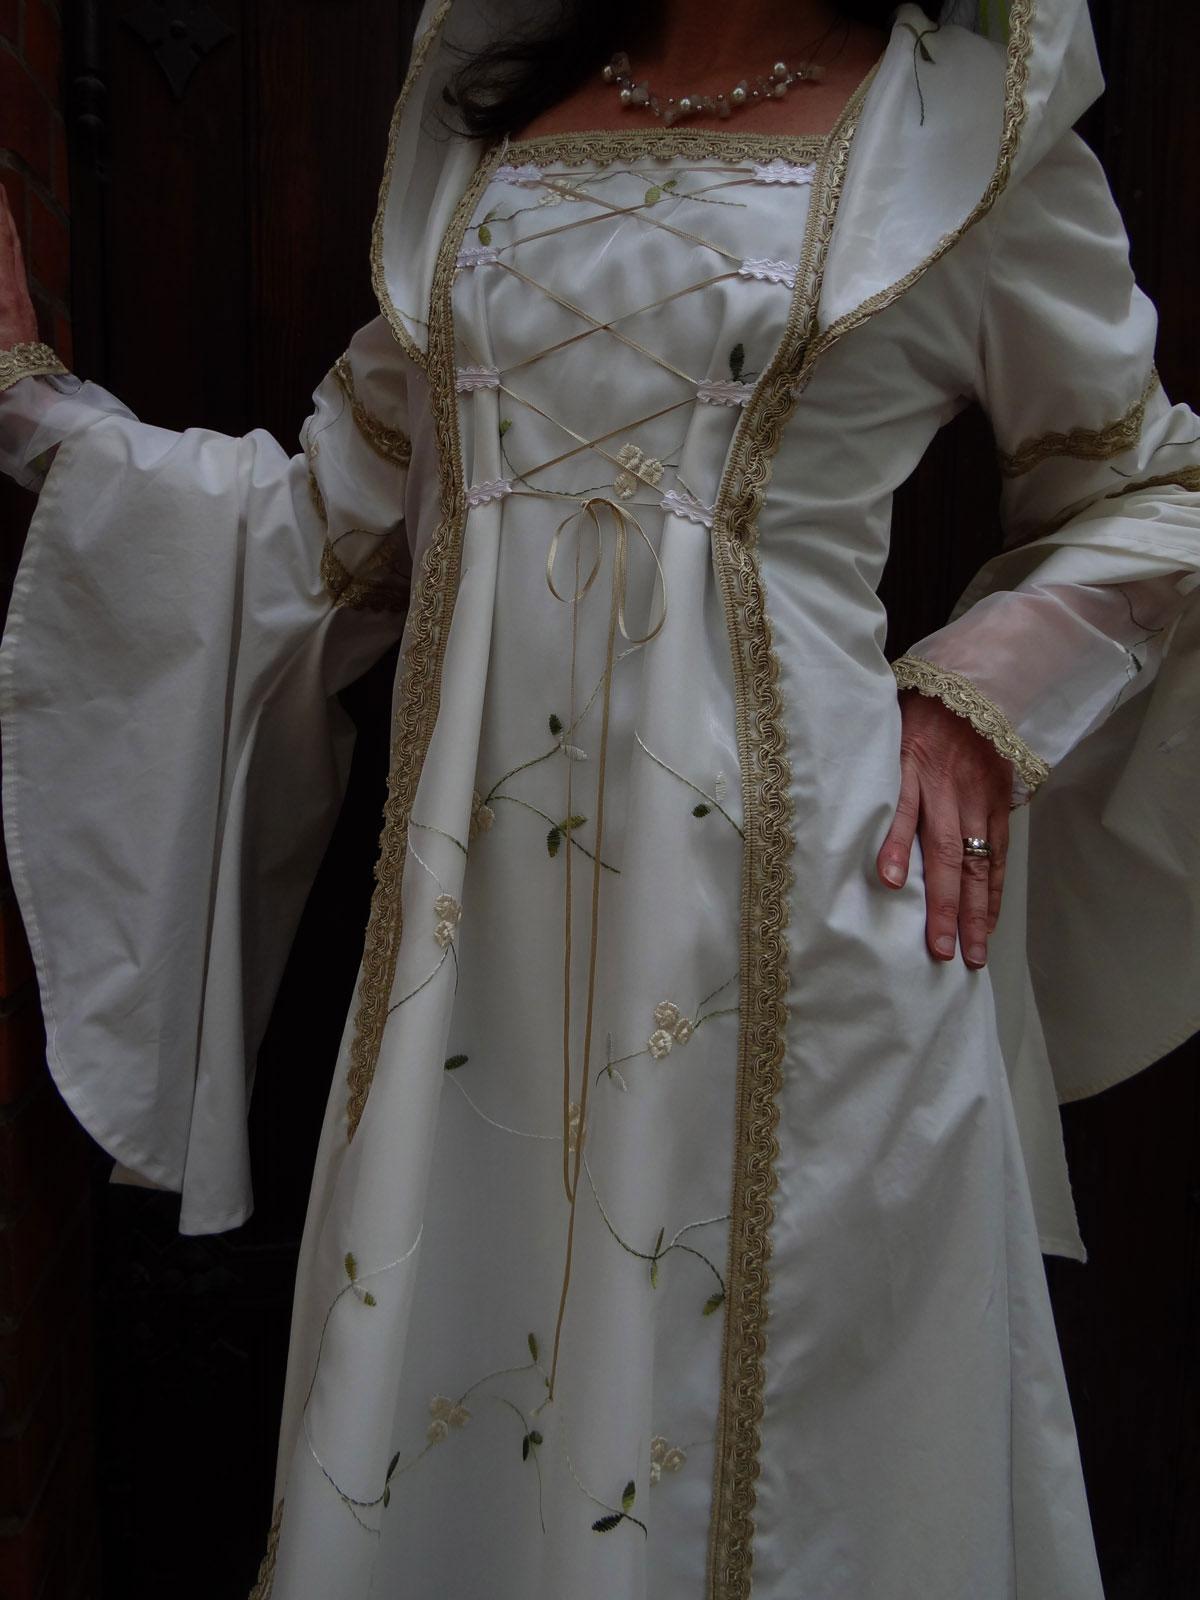 Feenkleid Elfenkleid Brautkleid Hochzeitskleid Stickerei Elfe Trompetenärmel